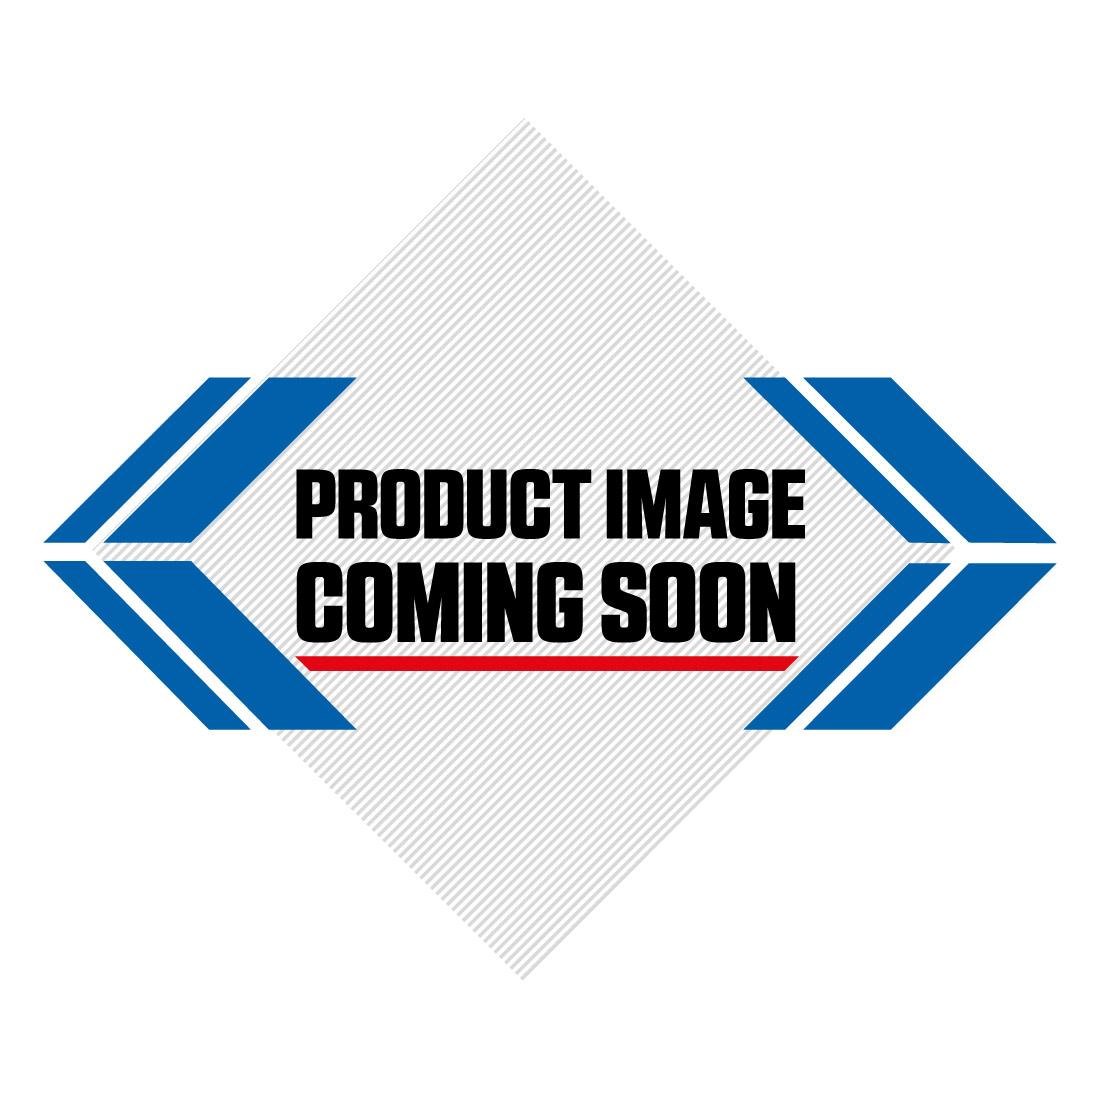 DJI Goggles - Immersive FPV Goggles